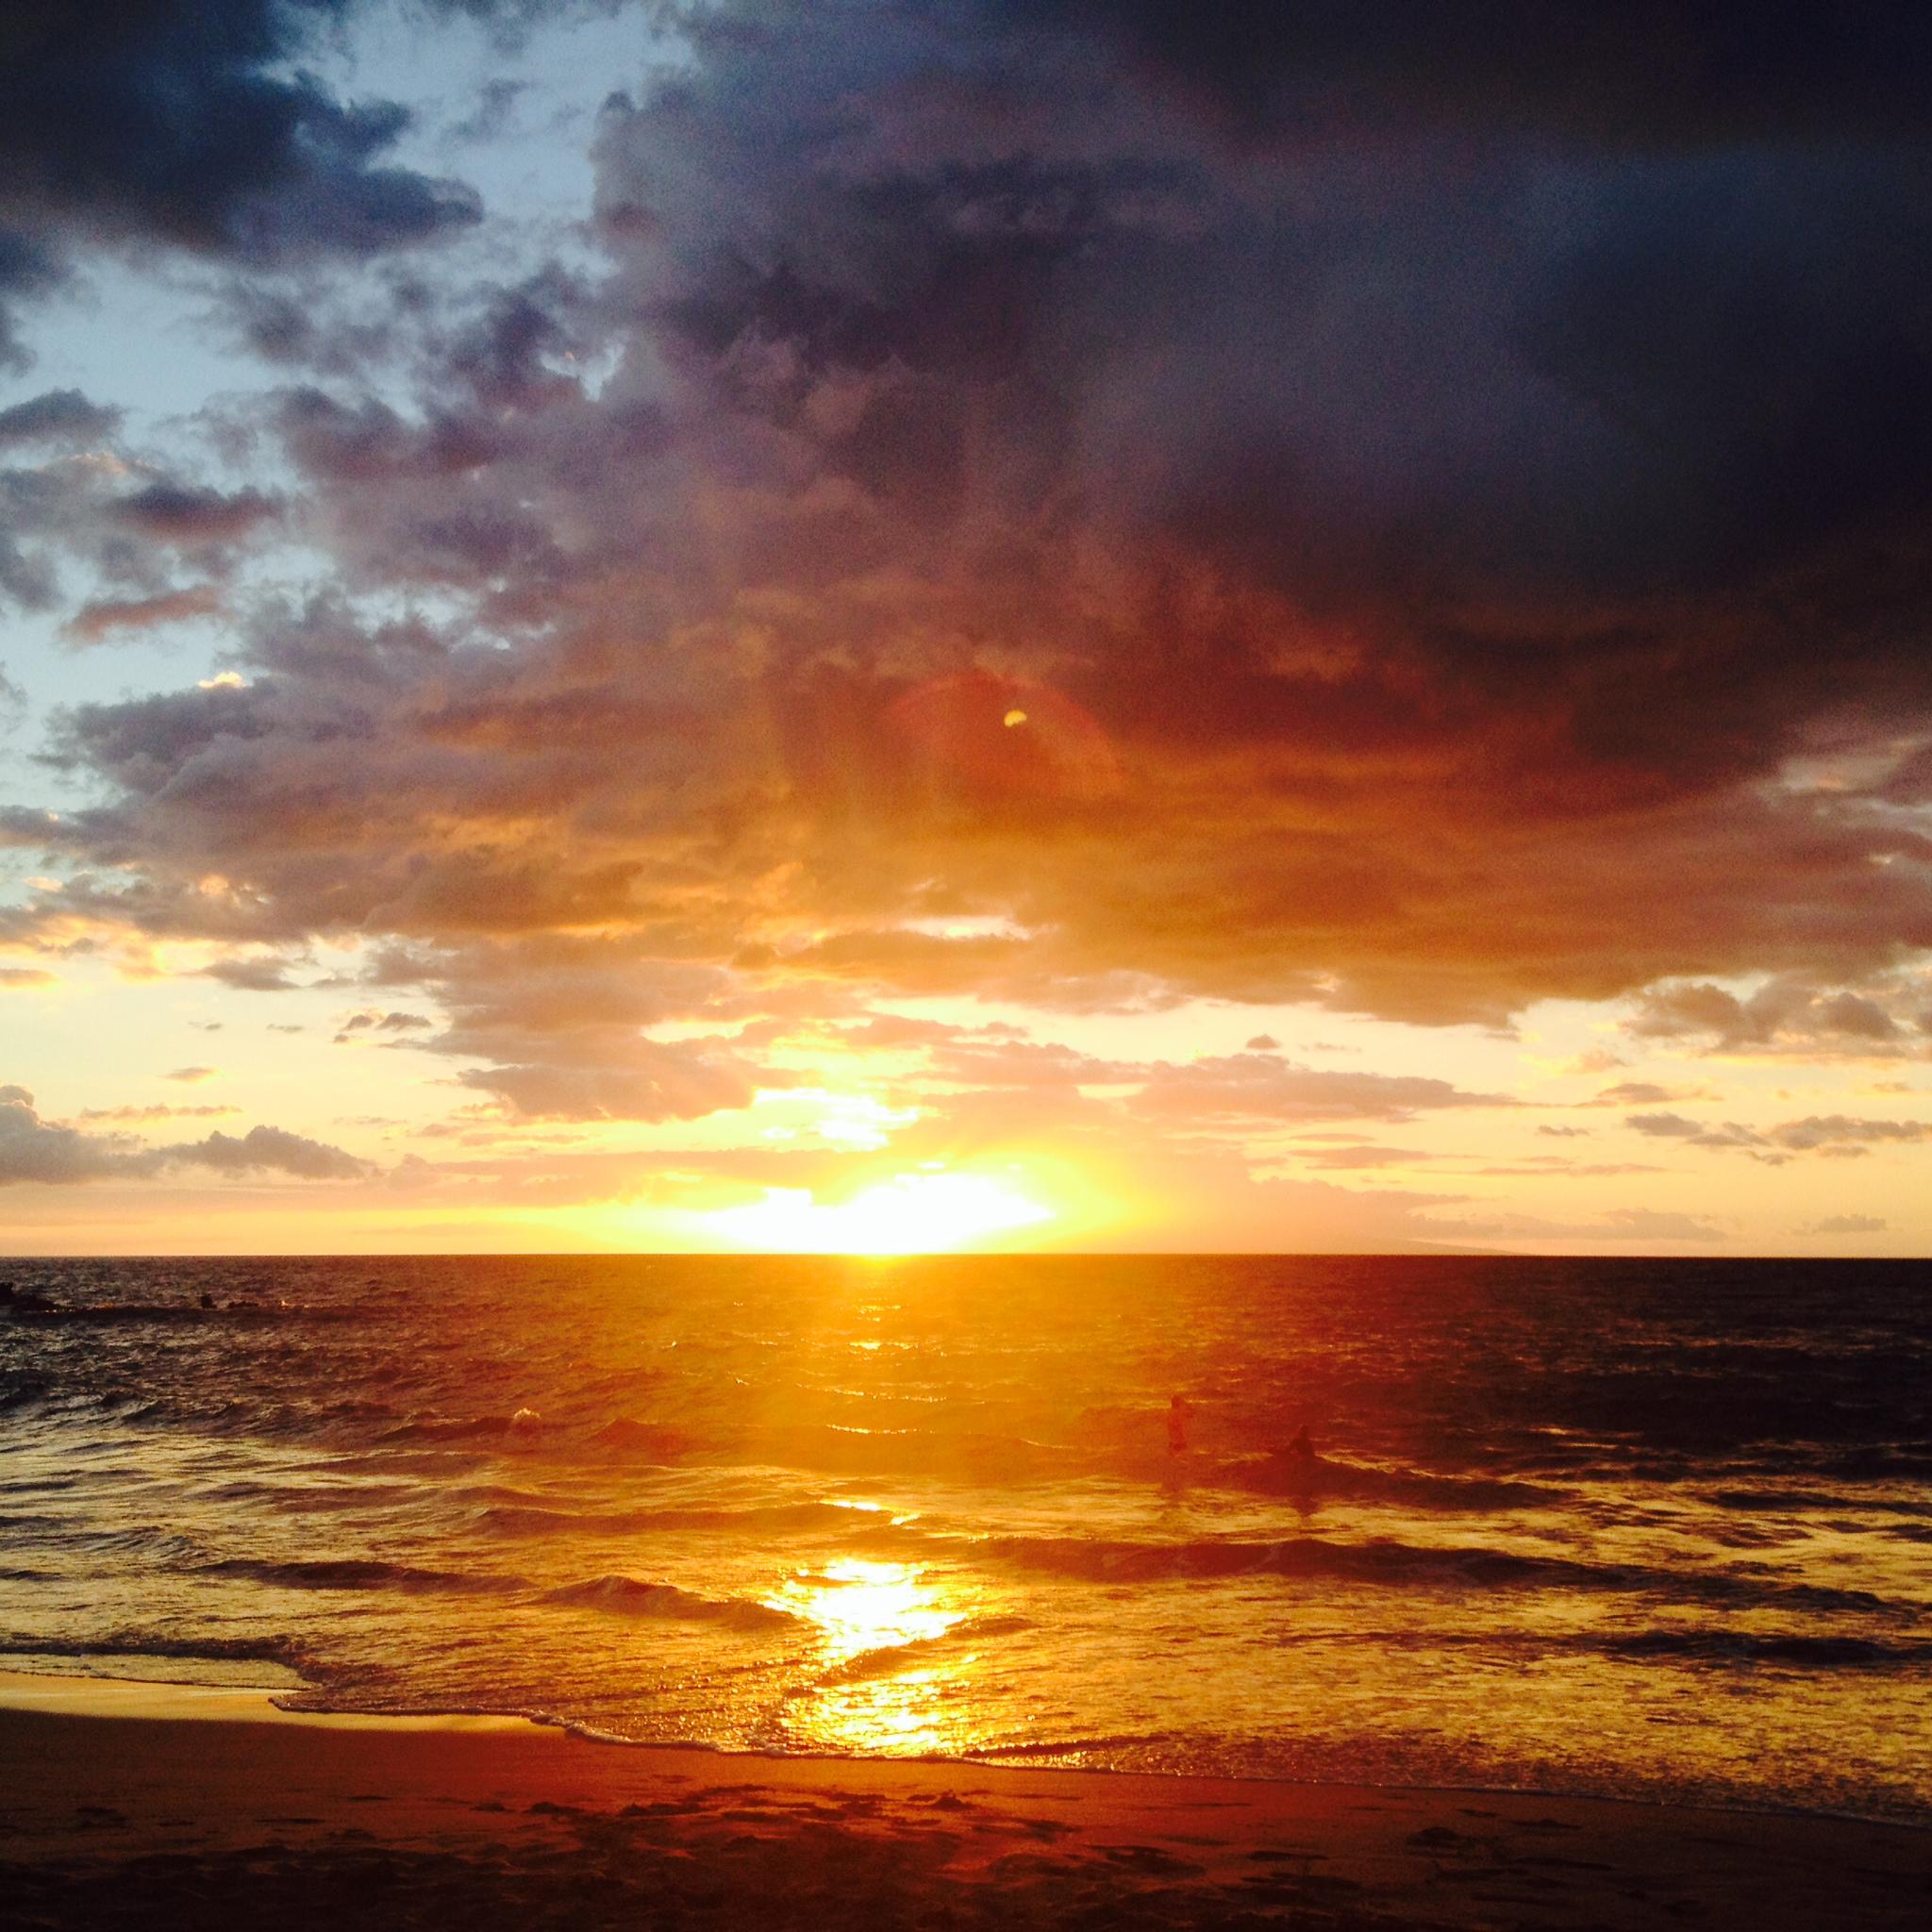 Susnet at Wailea Beach, Maui, Hawaii